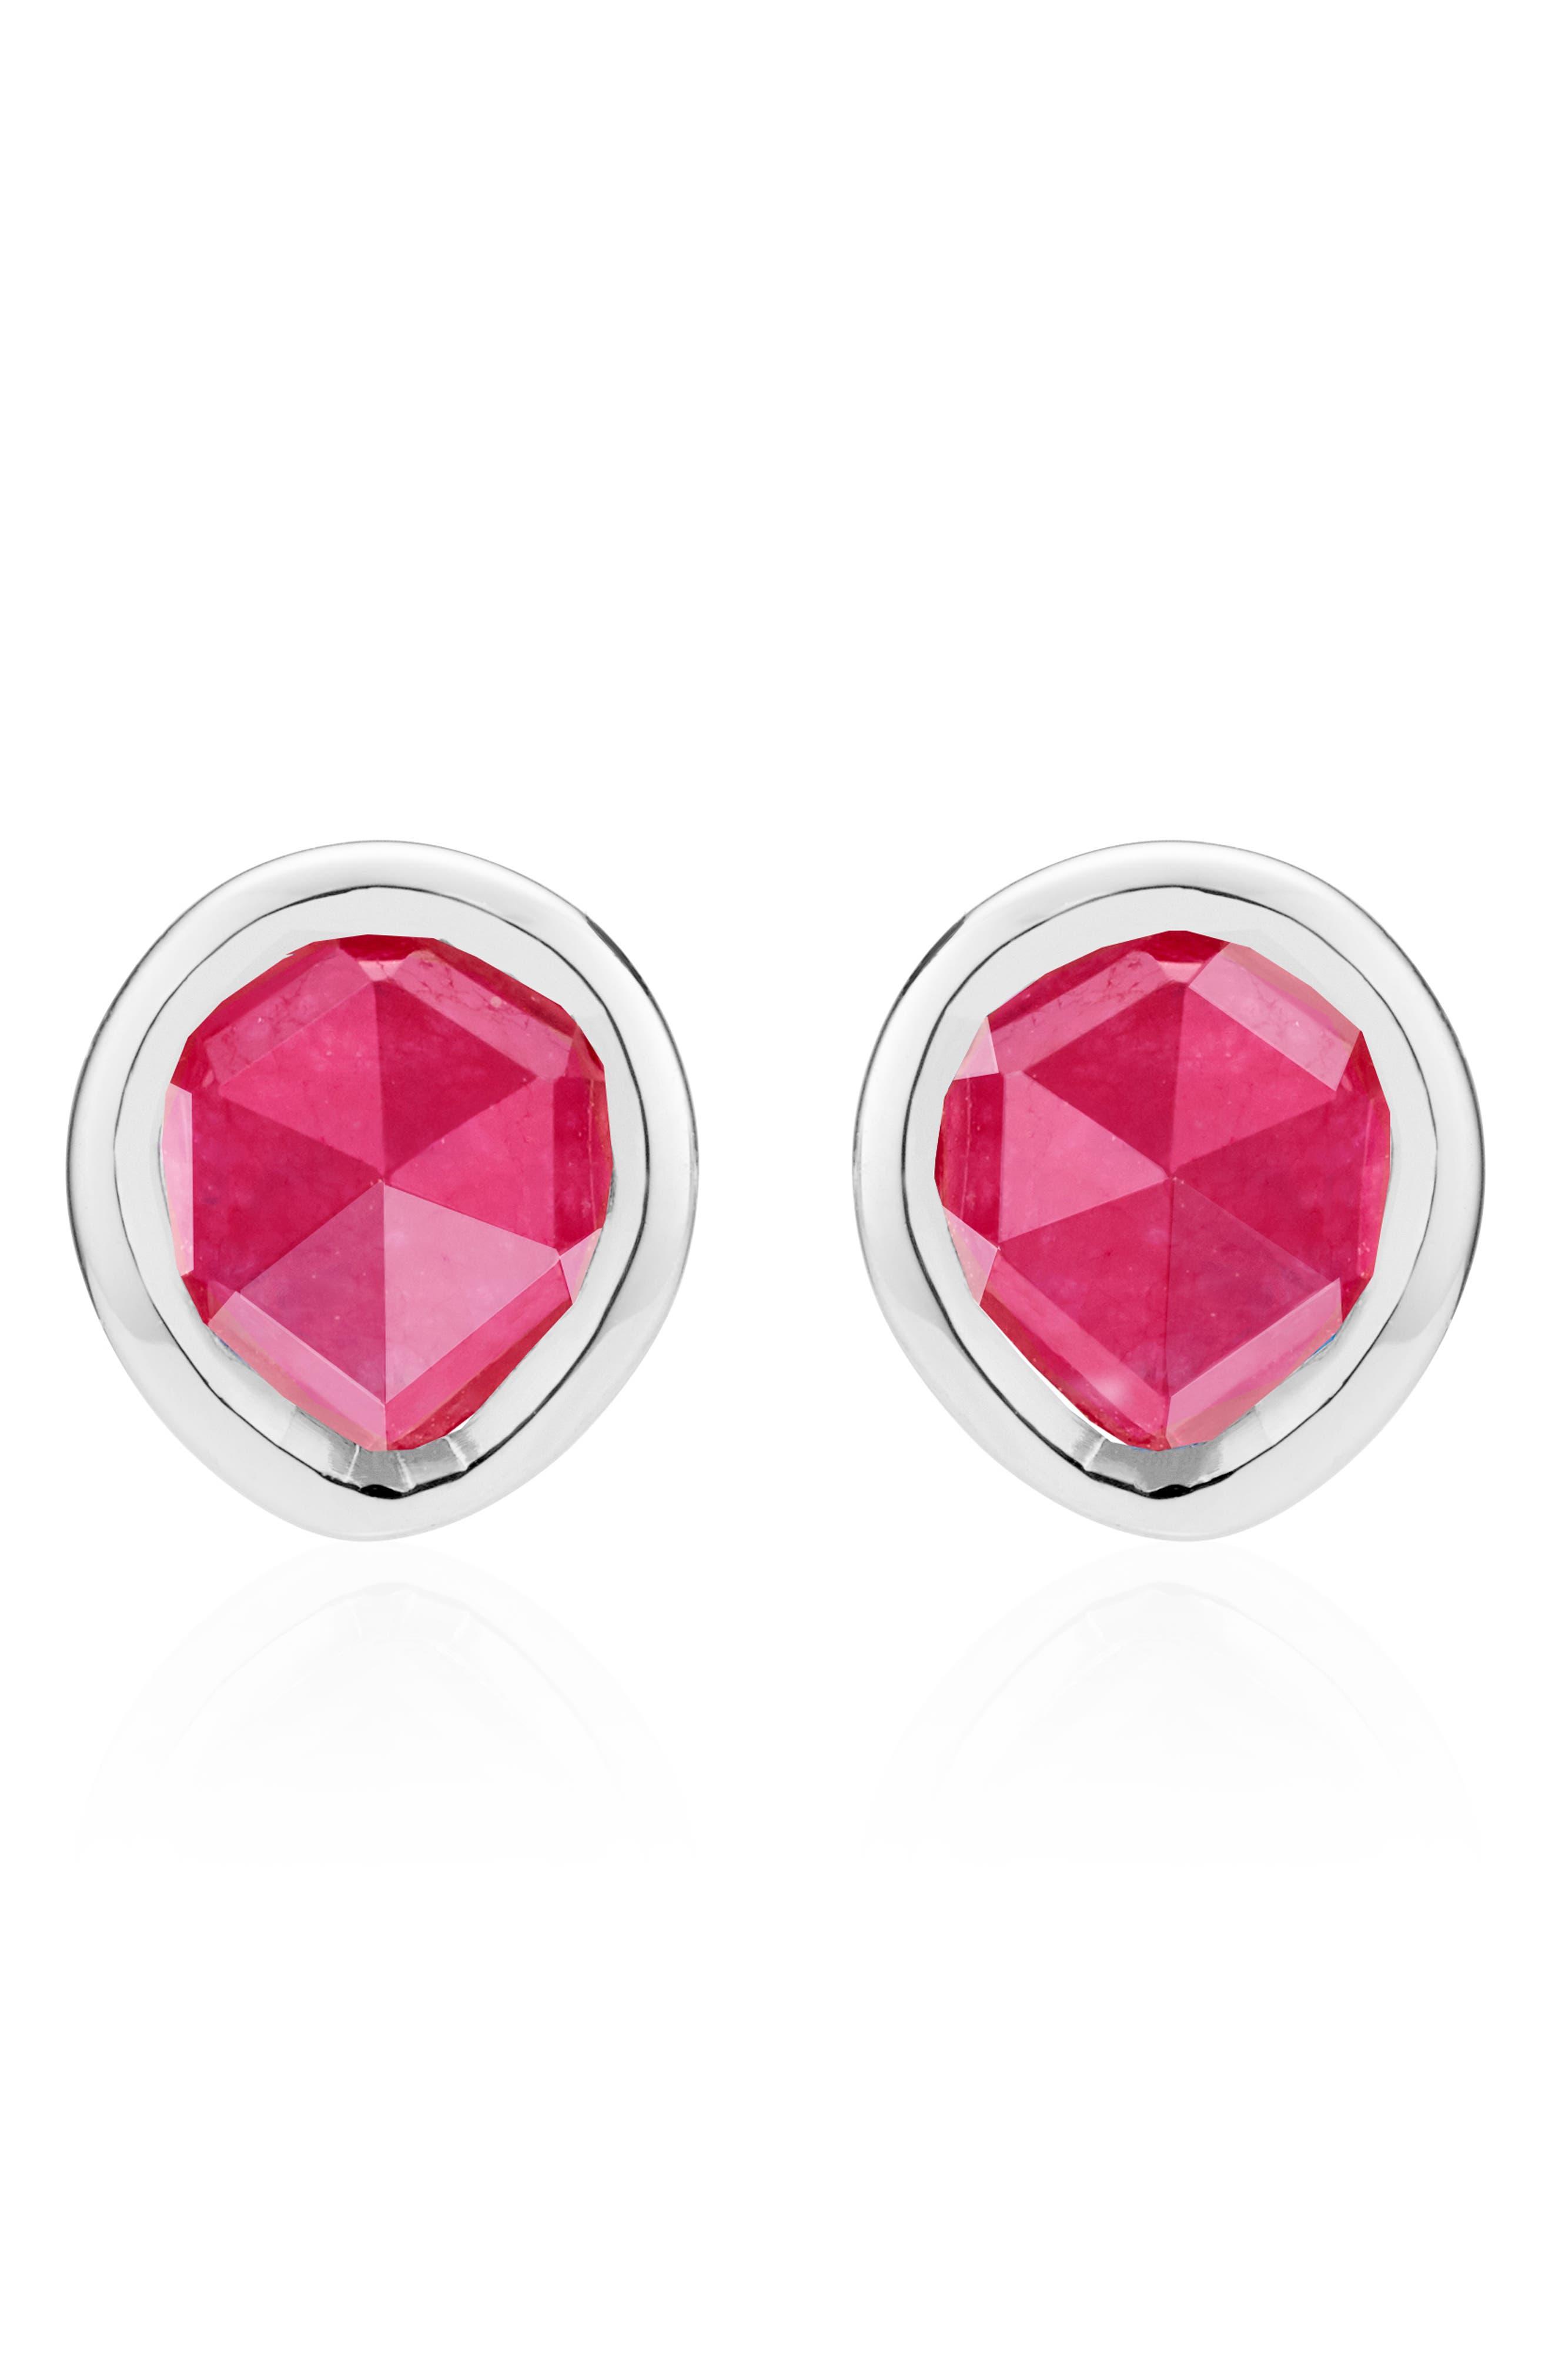 Siren Mini Stud Earrings,                         Main,                         color, Silver/ Pink Quartz